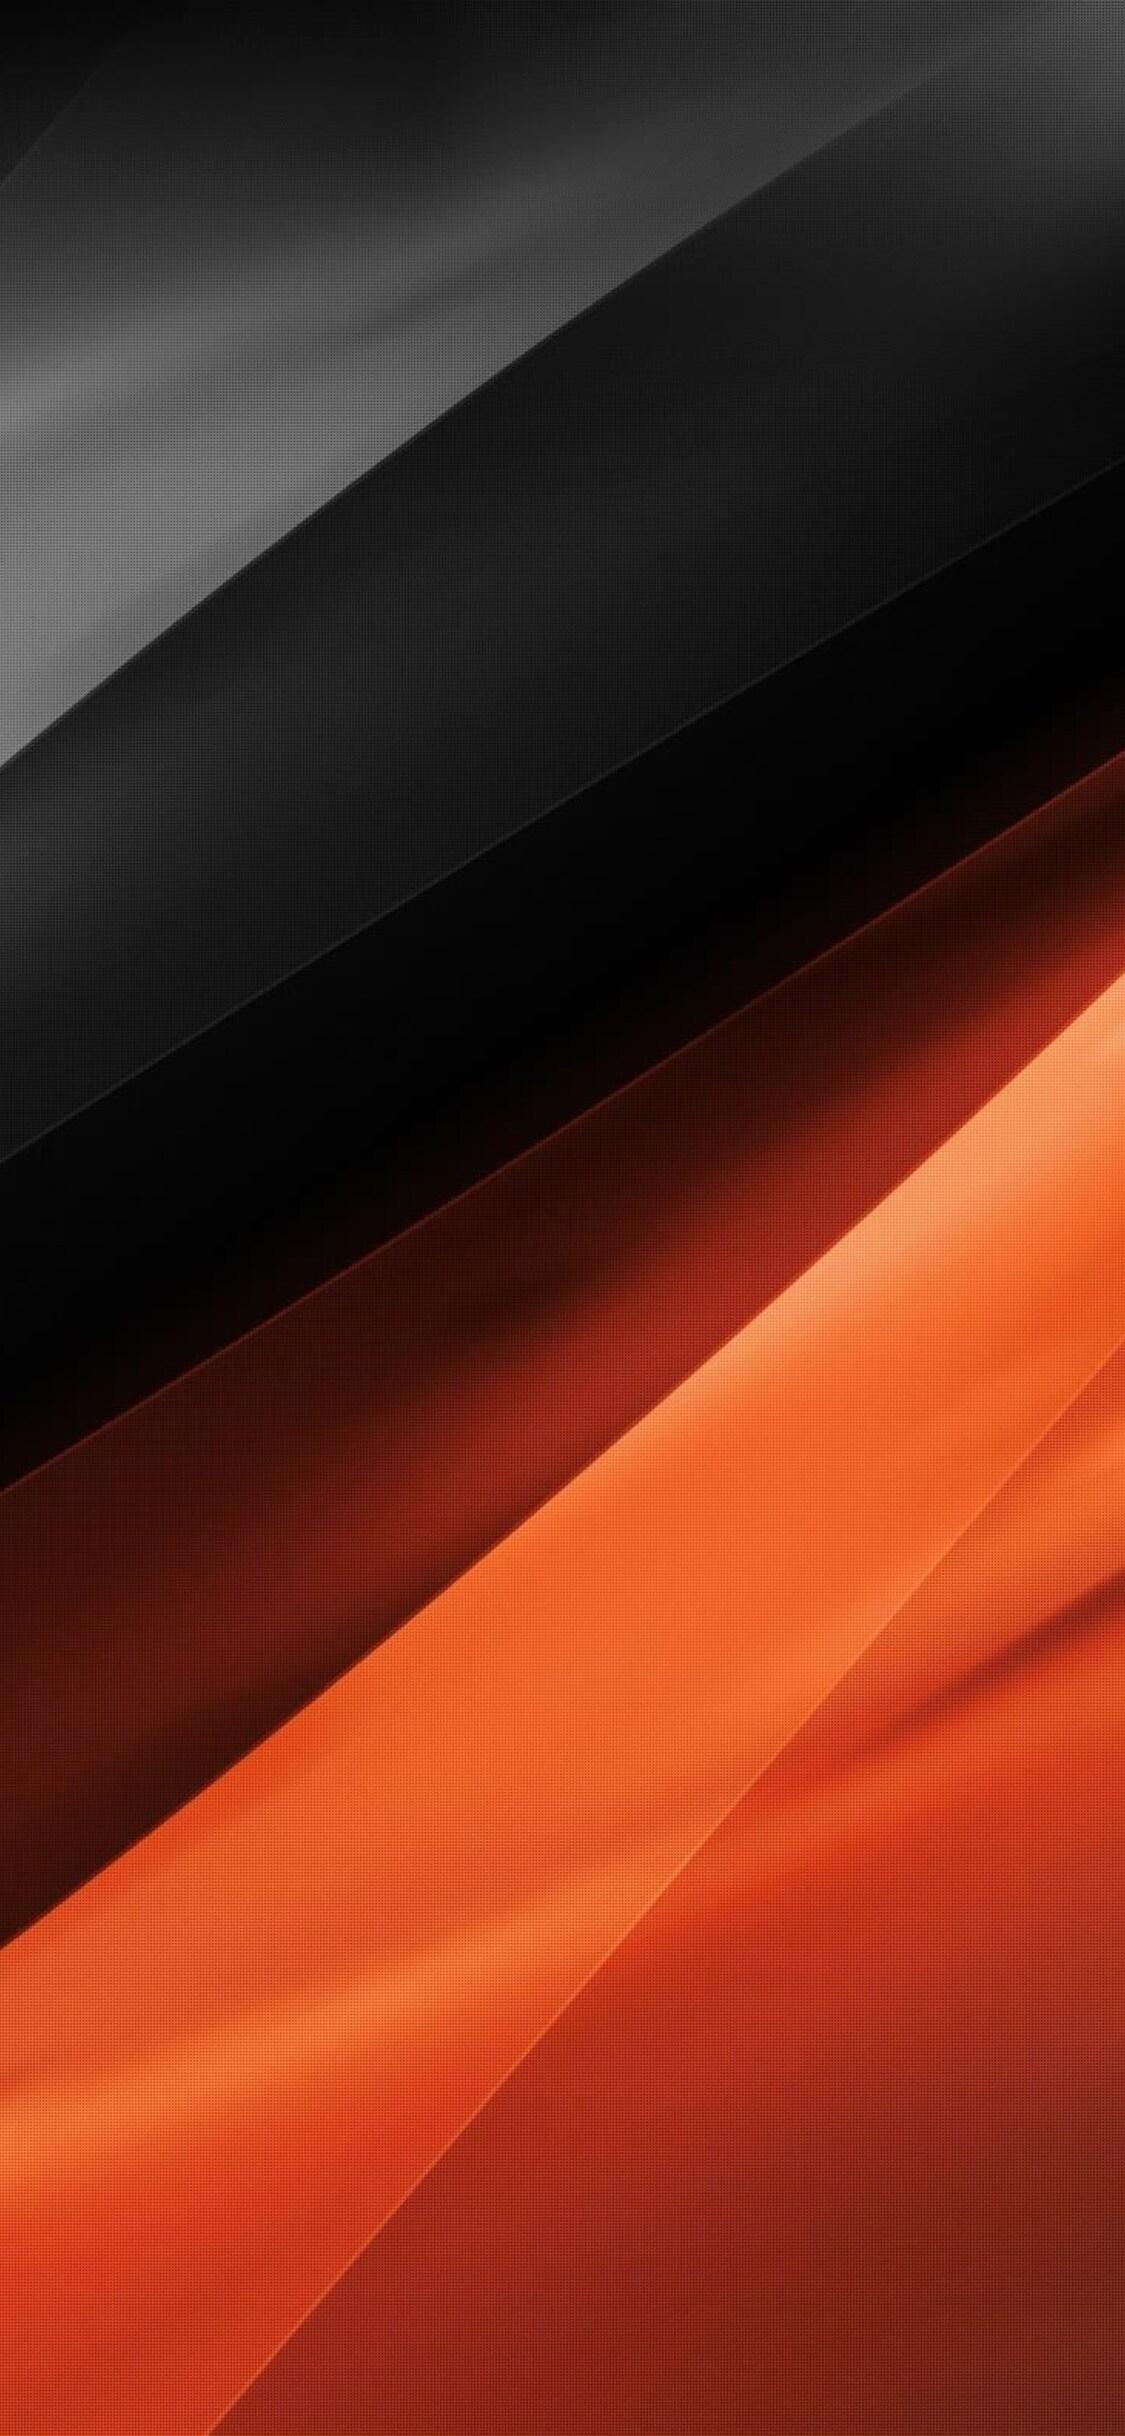 1125x2436 Abstract Dark Iphone Xs Iphone 10 Iphone X Hd 4k